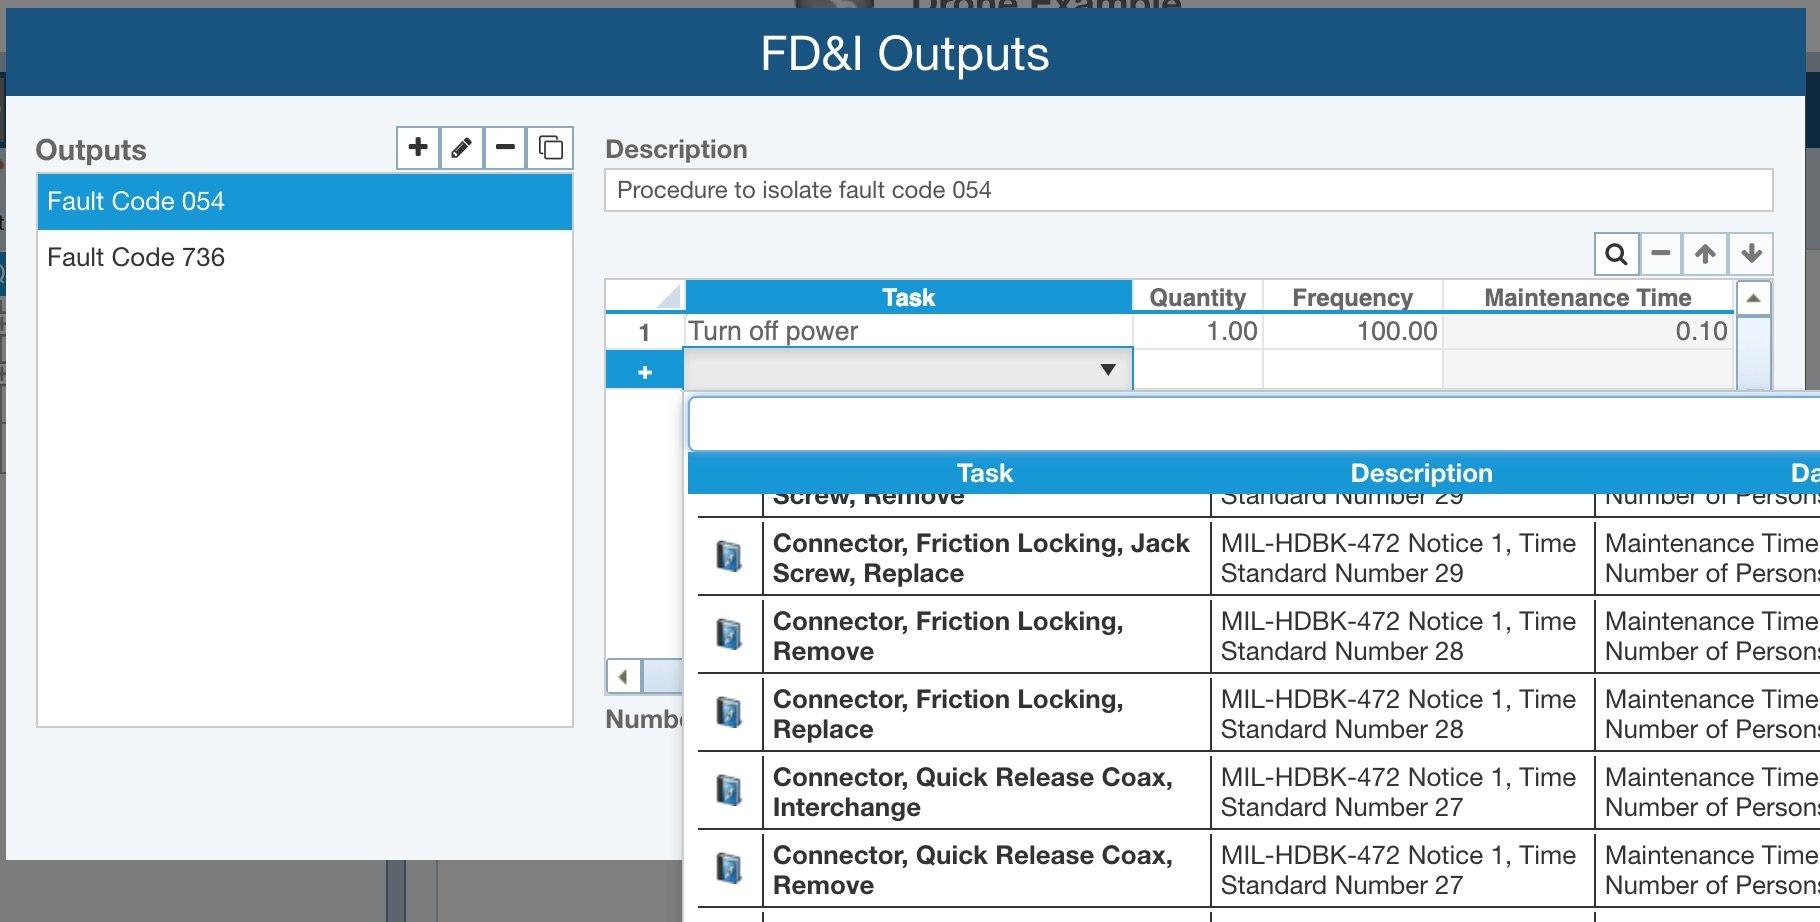 Maintainability Prediction FD&I Outputs